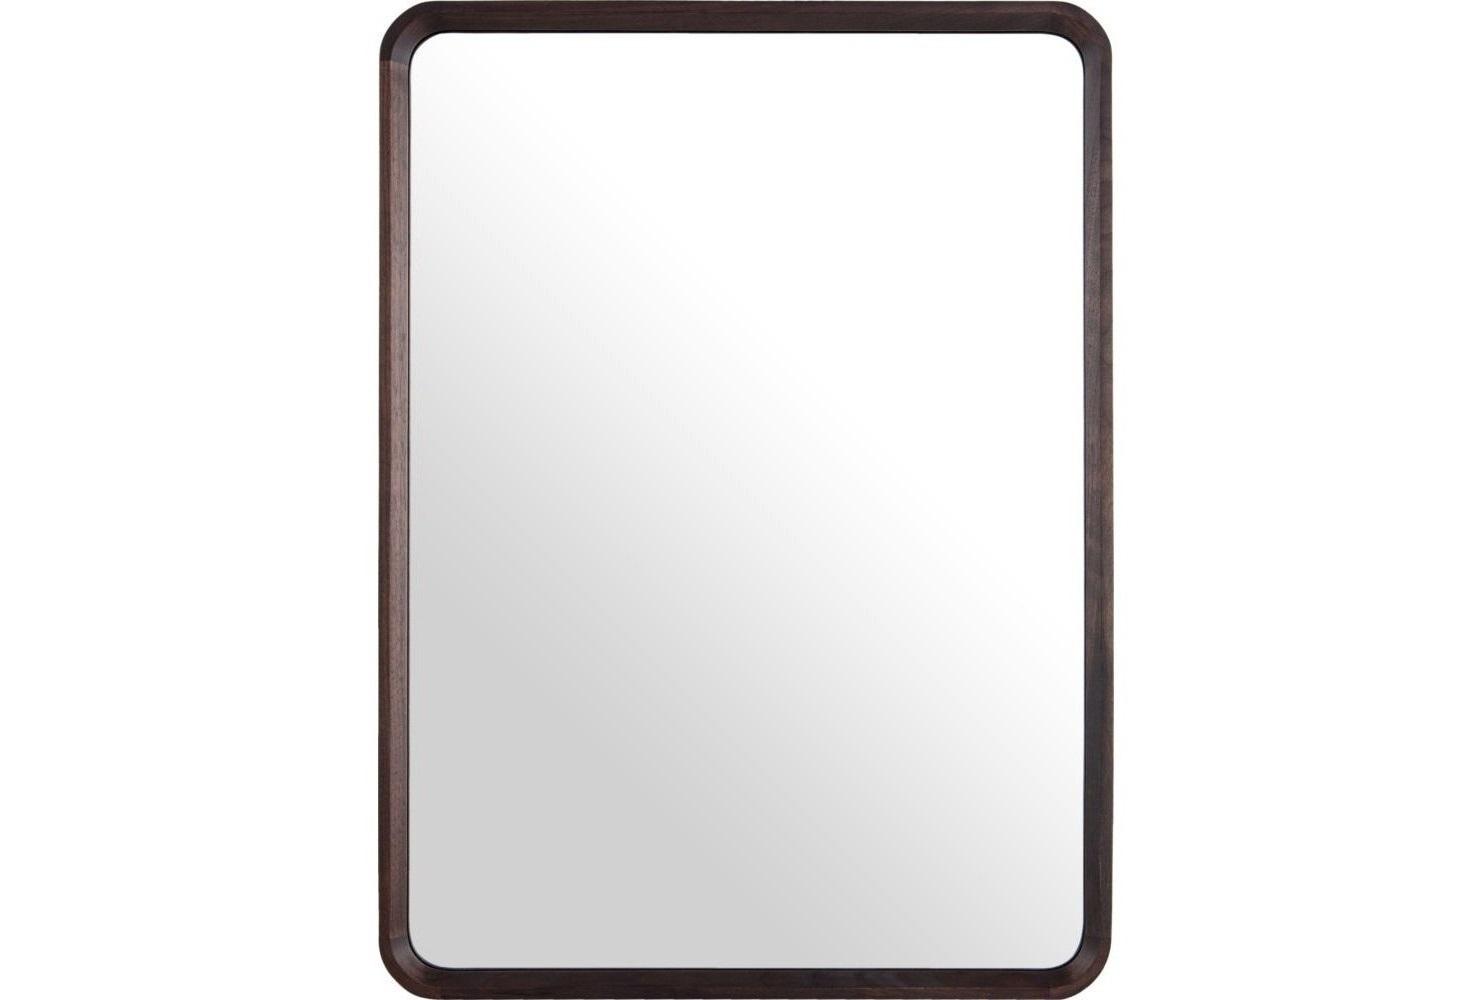 Зеркало. Производитель: Living, артикул: 56713